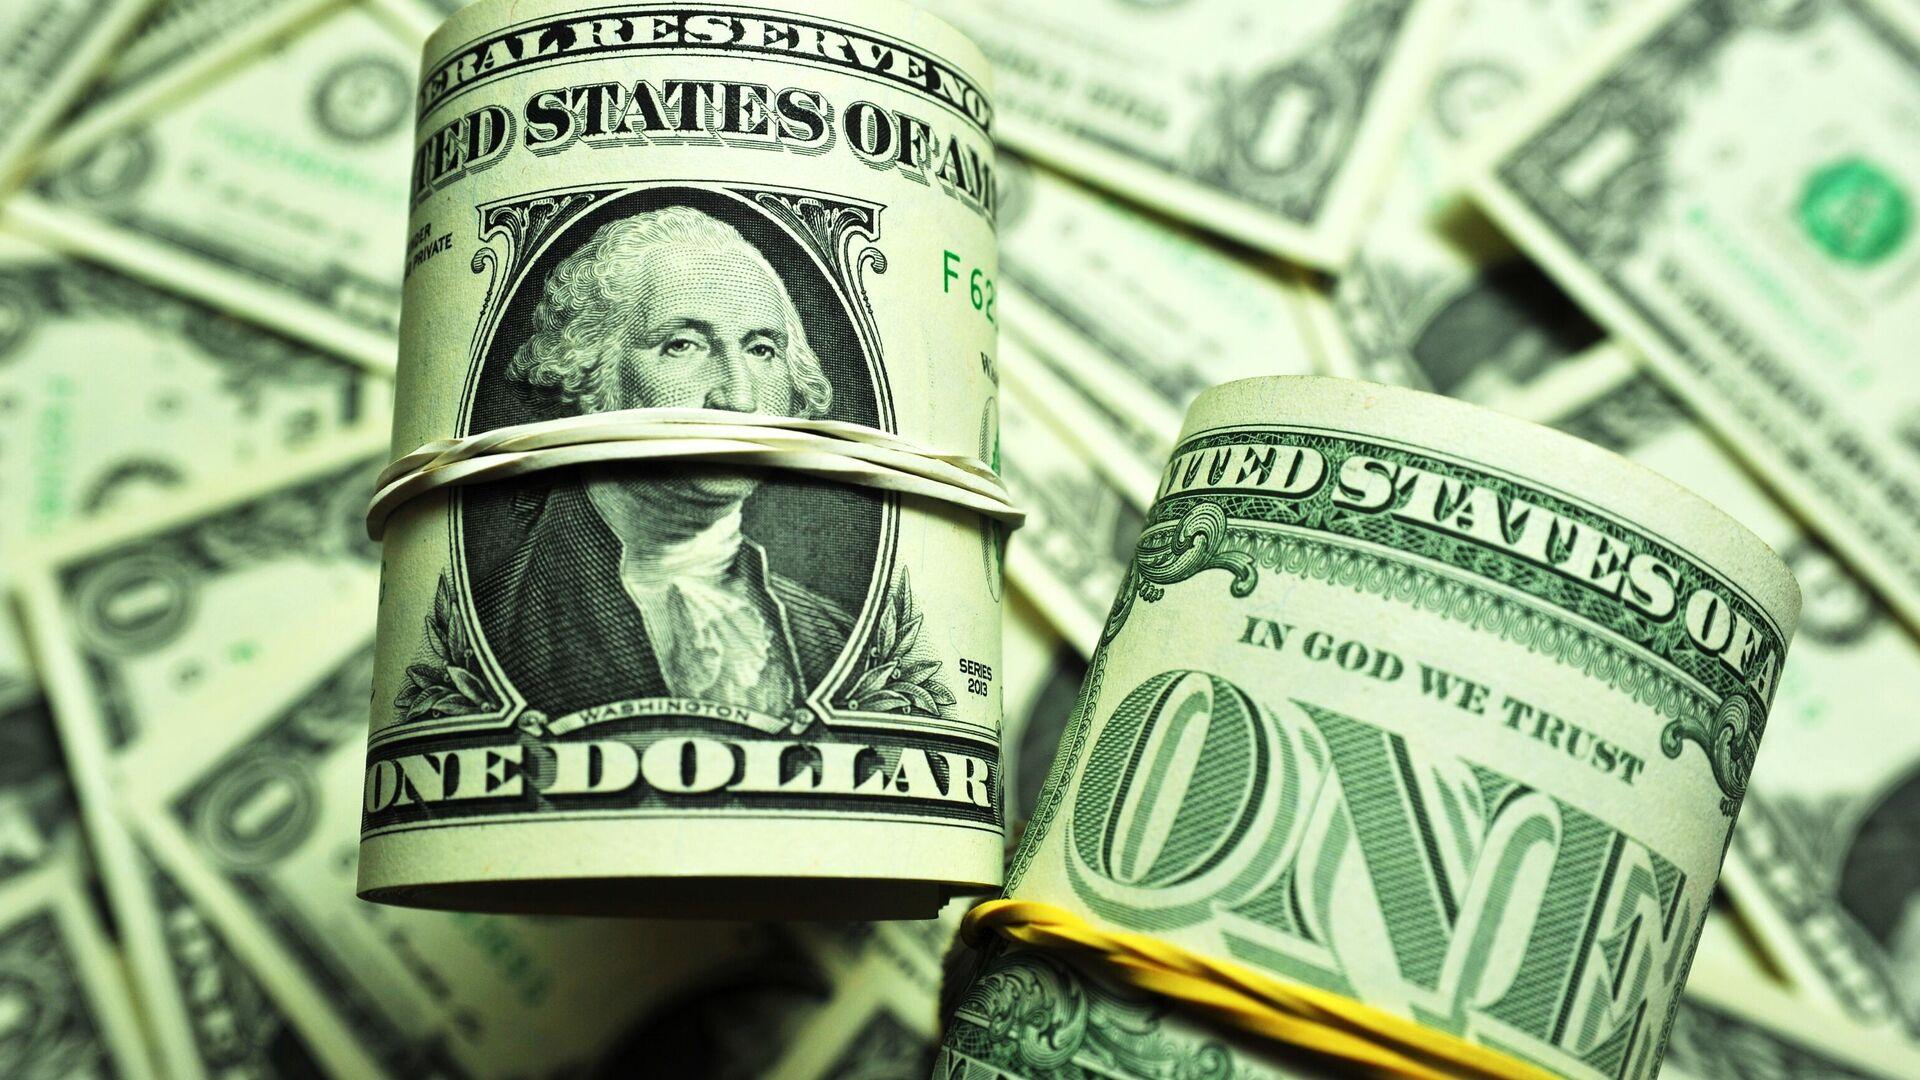 Банкноты номиналом 1 доллар США - РИА Новости, 1920, 07.05.2021